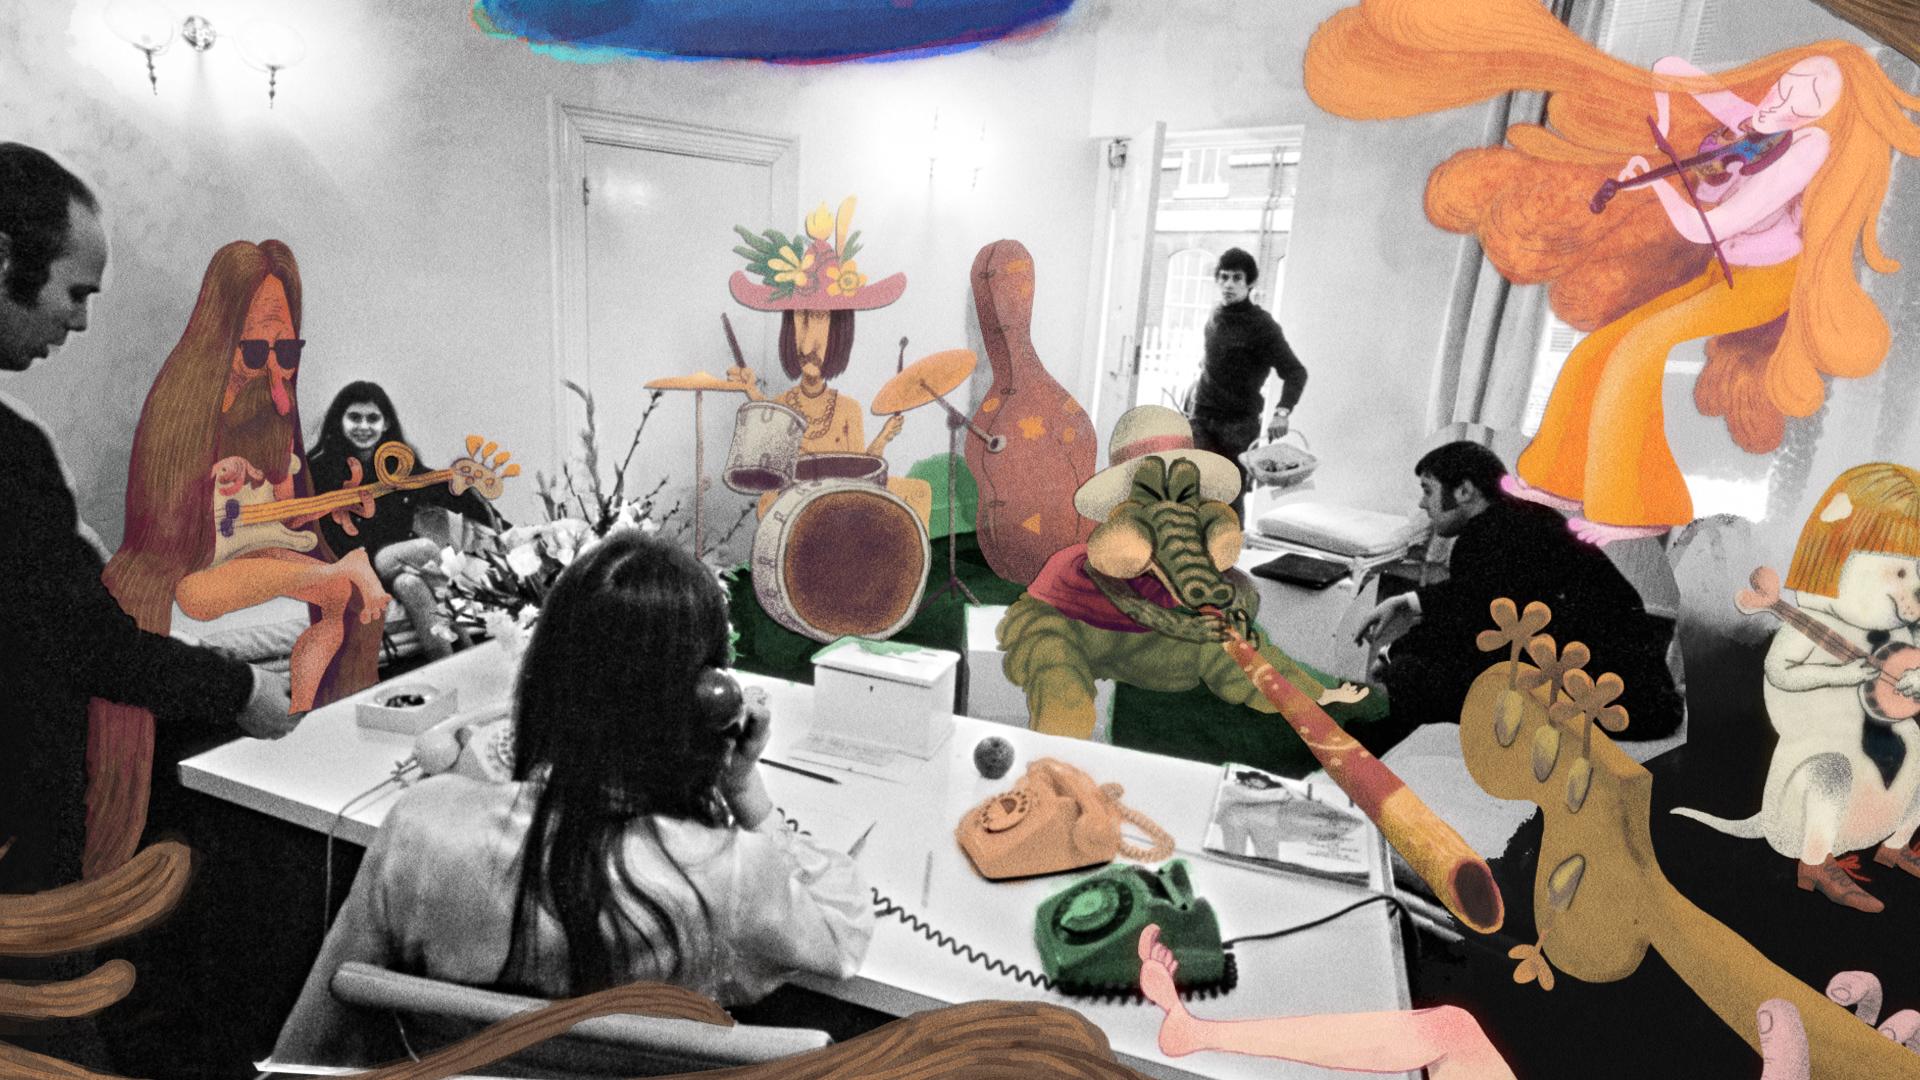 Beatles_Apple_Still_CREDIT_FONS_SCHIEDON_0044__ 3.jpg